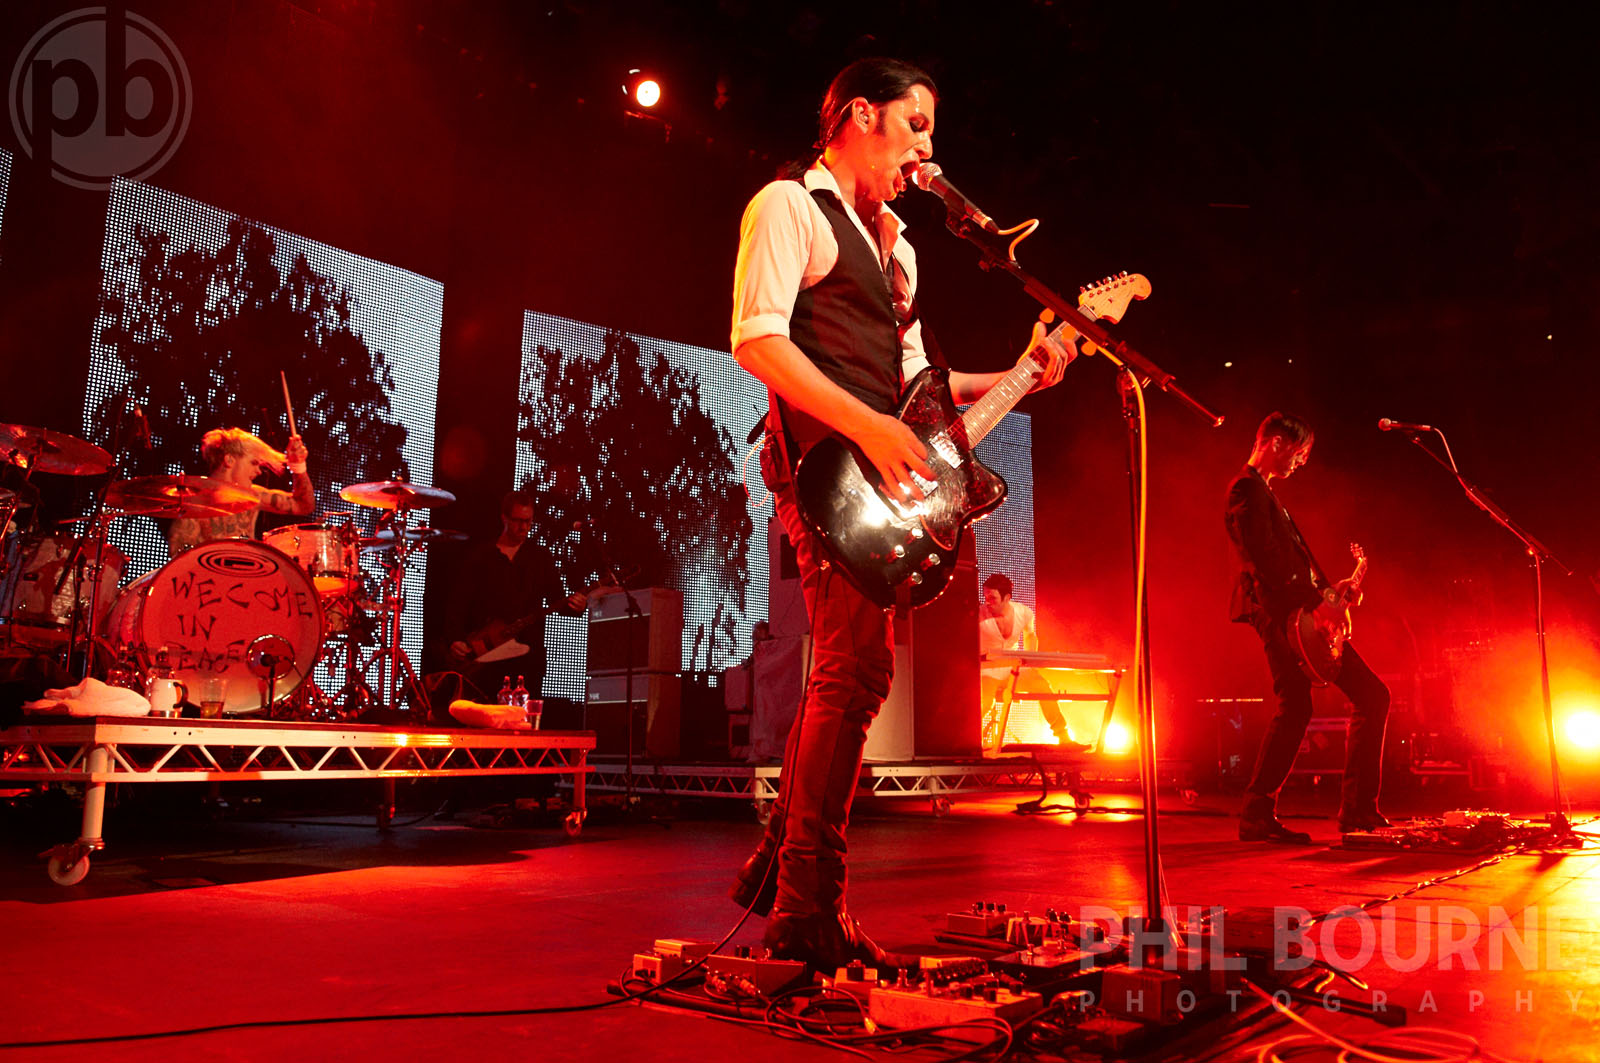 048_Live_Music_Photographer_London_Placebo_001.jpg